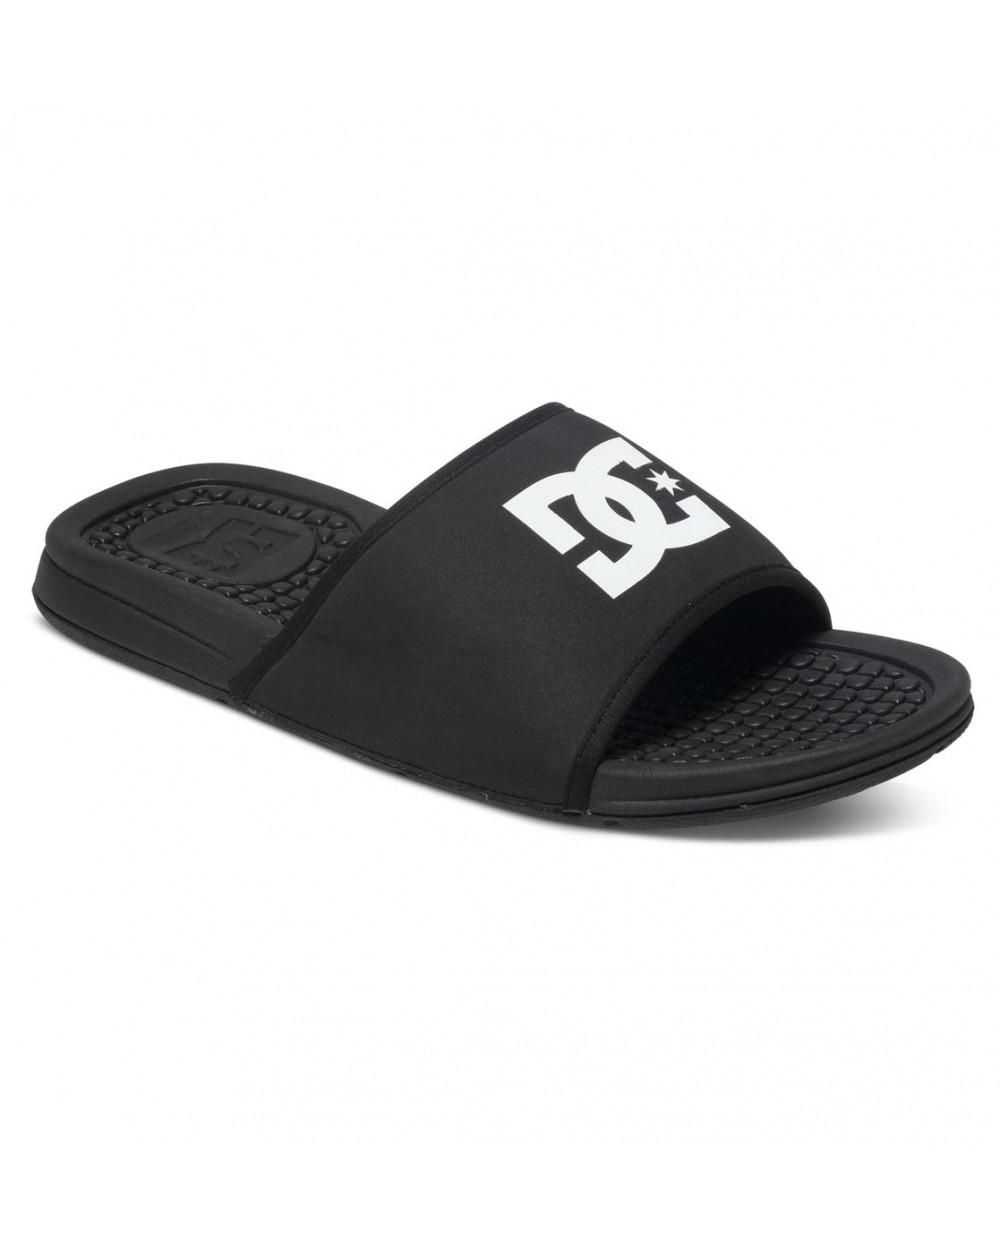 Dc Bolsa Slider Sandals - Black (blk)